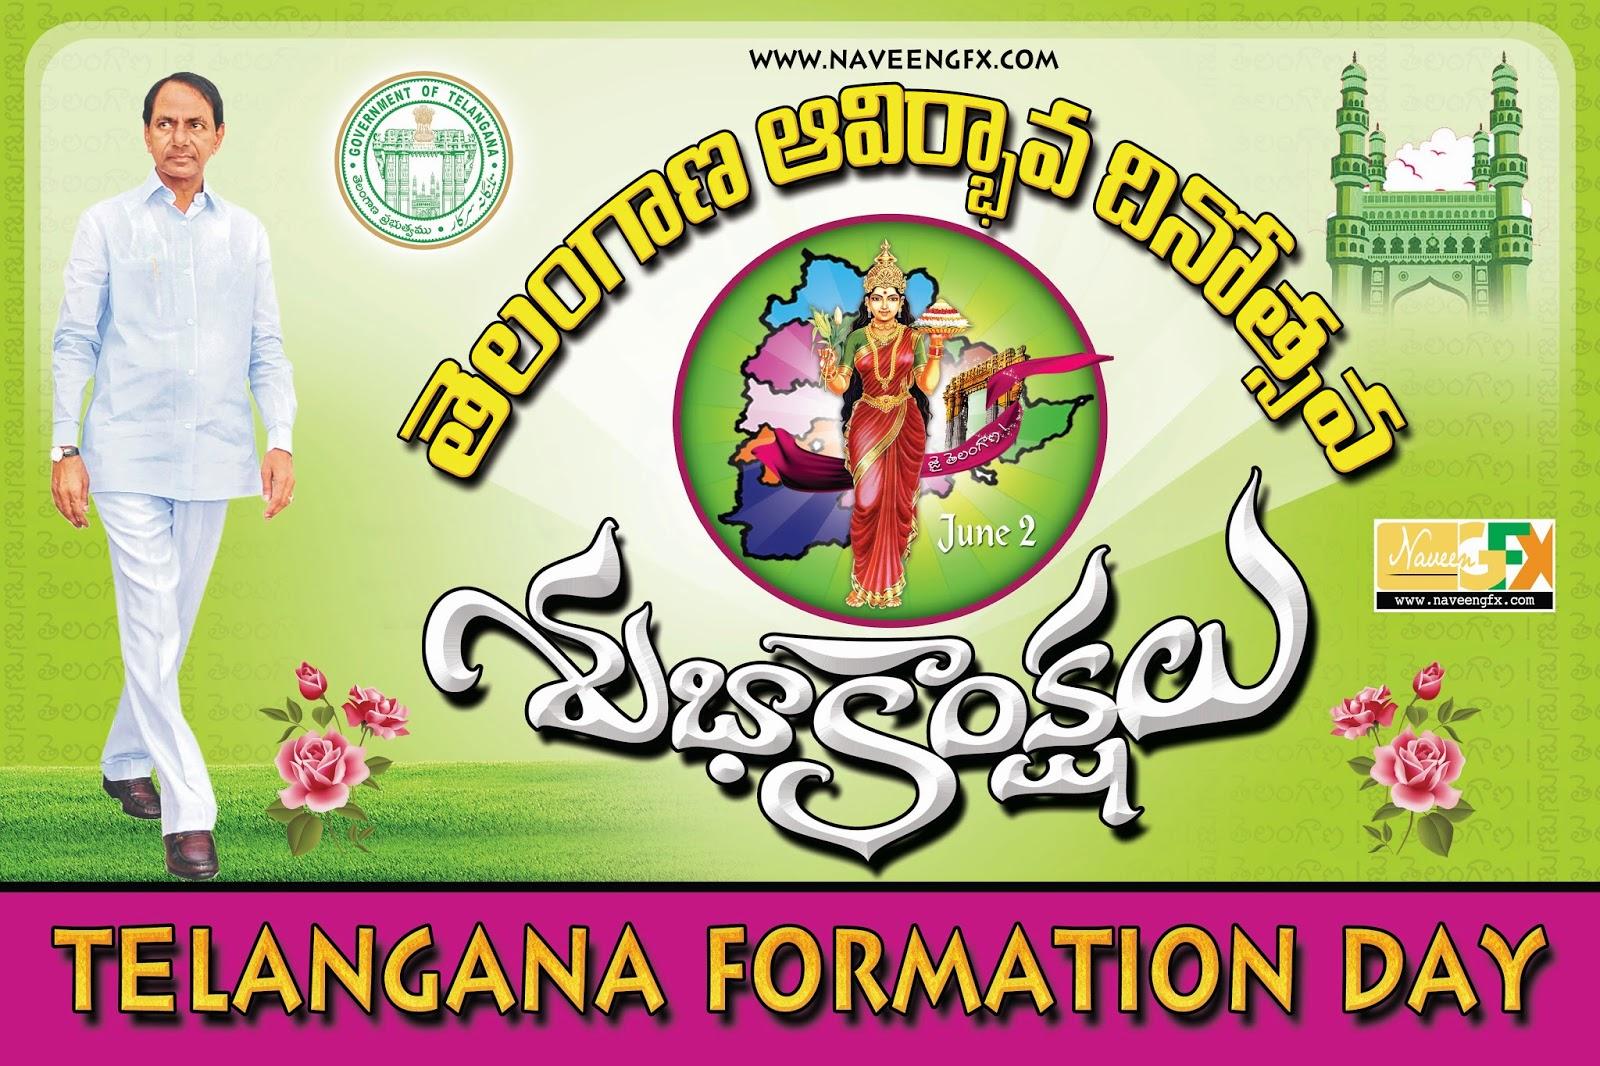 Telangana formation day greetings wallpapers